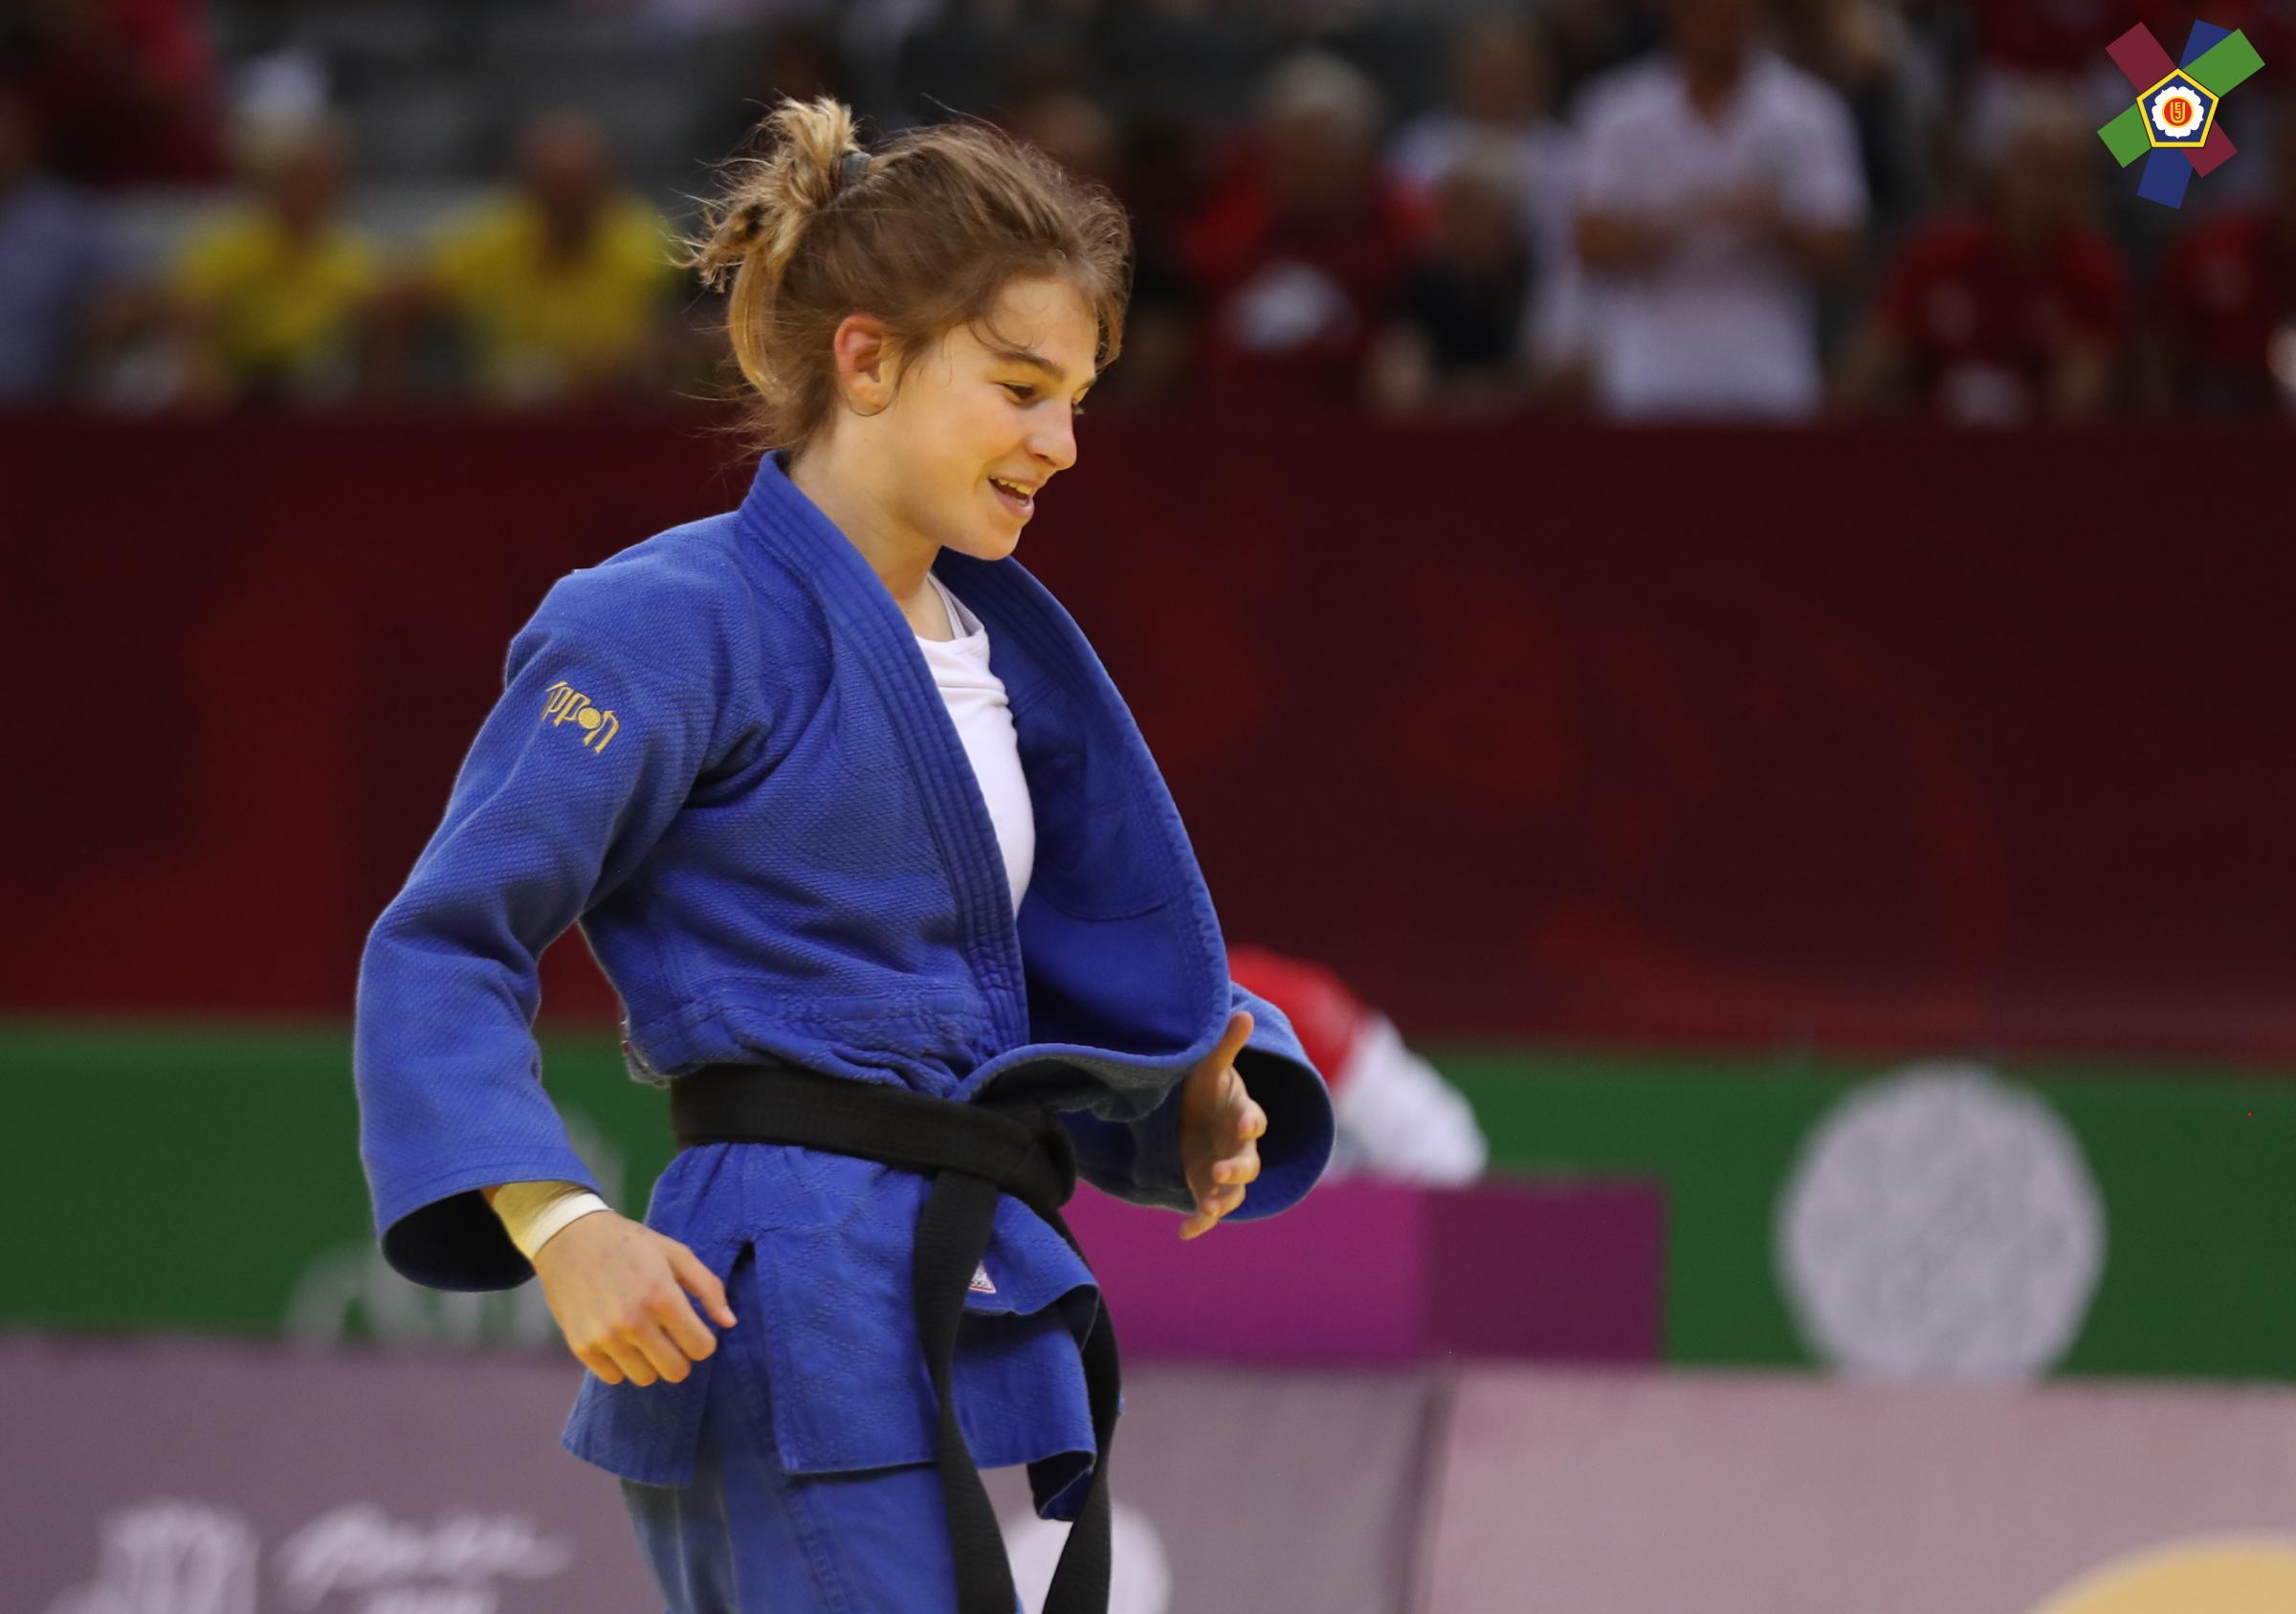 EJU-European-Youth-Olympic-Festival-Baku-2019-Puljiz-1